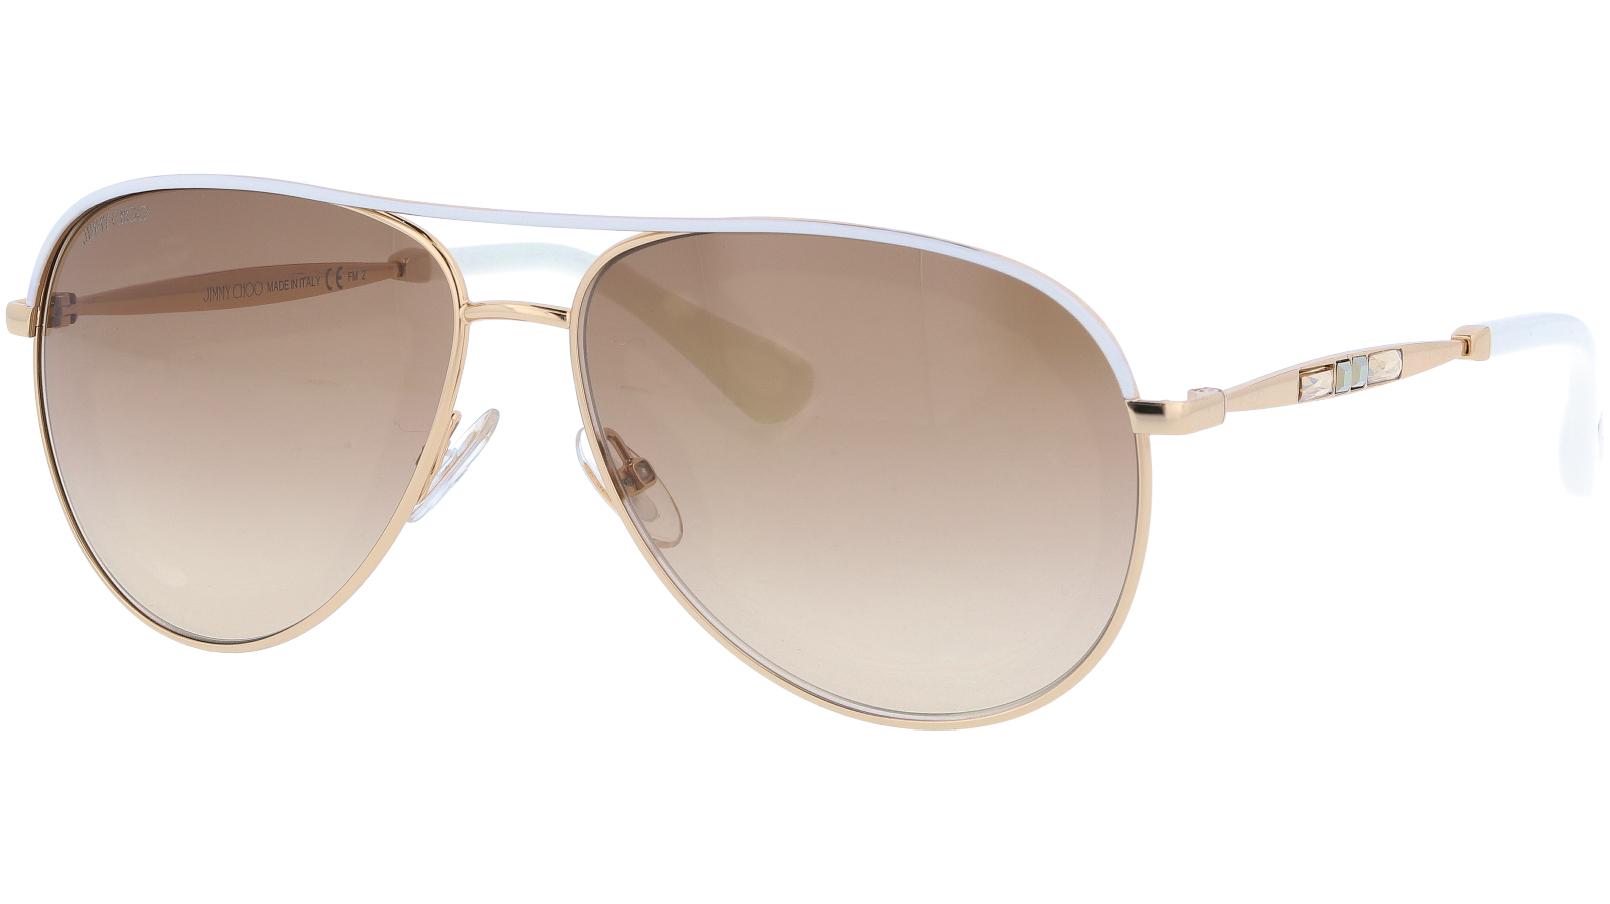 JIMMY CHOO JEWLYS 150S1 58 ROSE Sunglasses